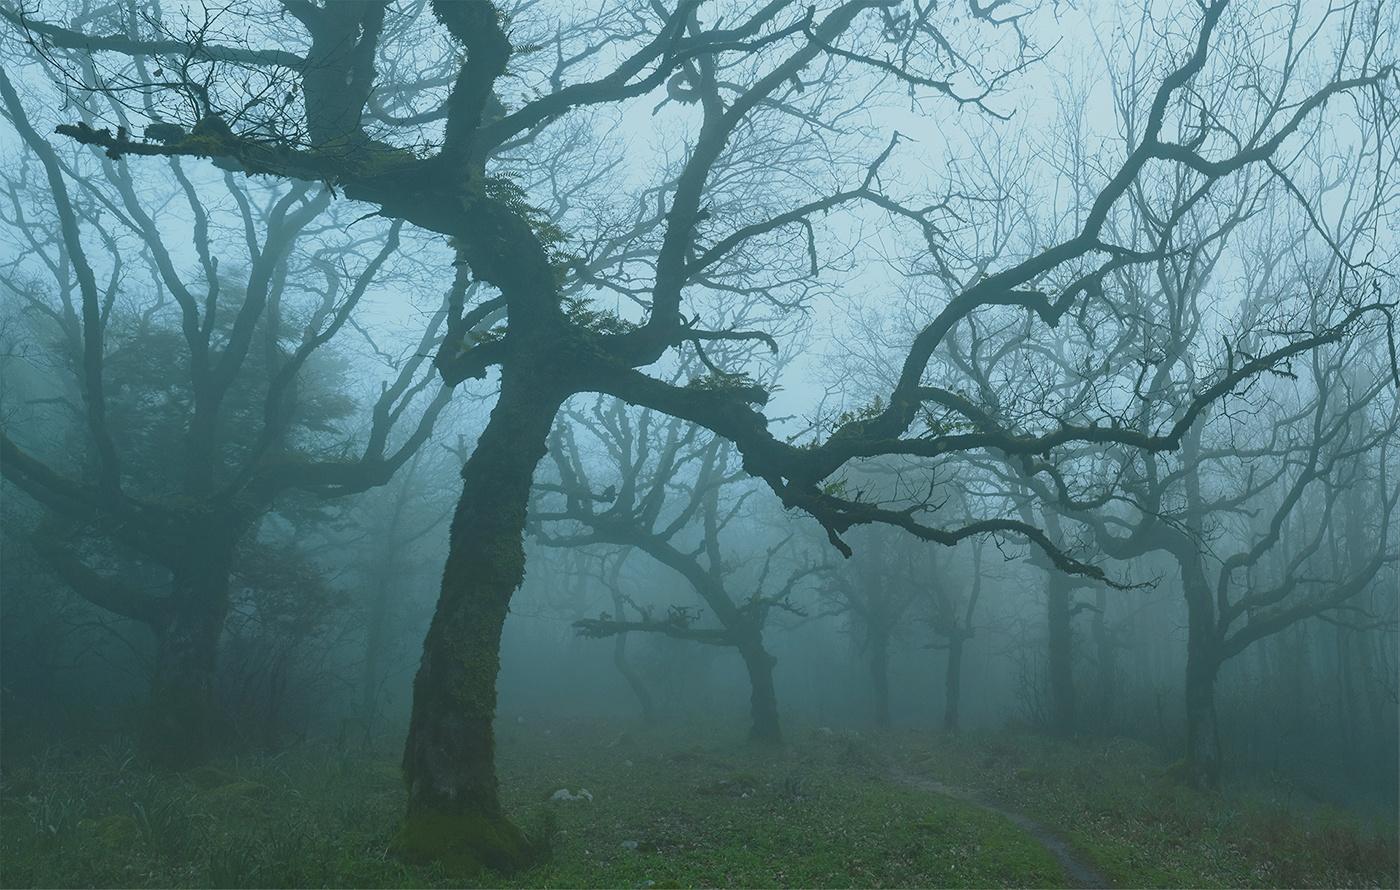 Los Alcornocales - Phantasmagoric - Peter Manschot Al Andalus Photo Tour, Landscape photography photos prints workshops Andalusia Spain